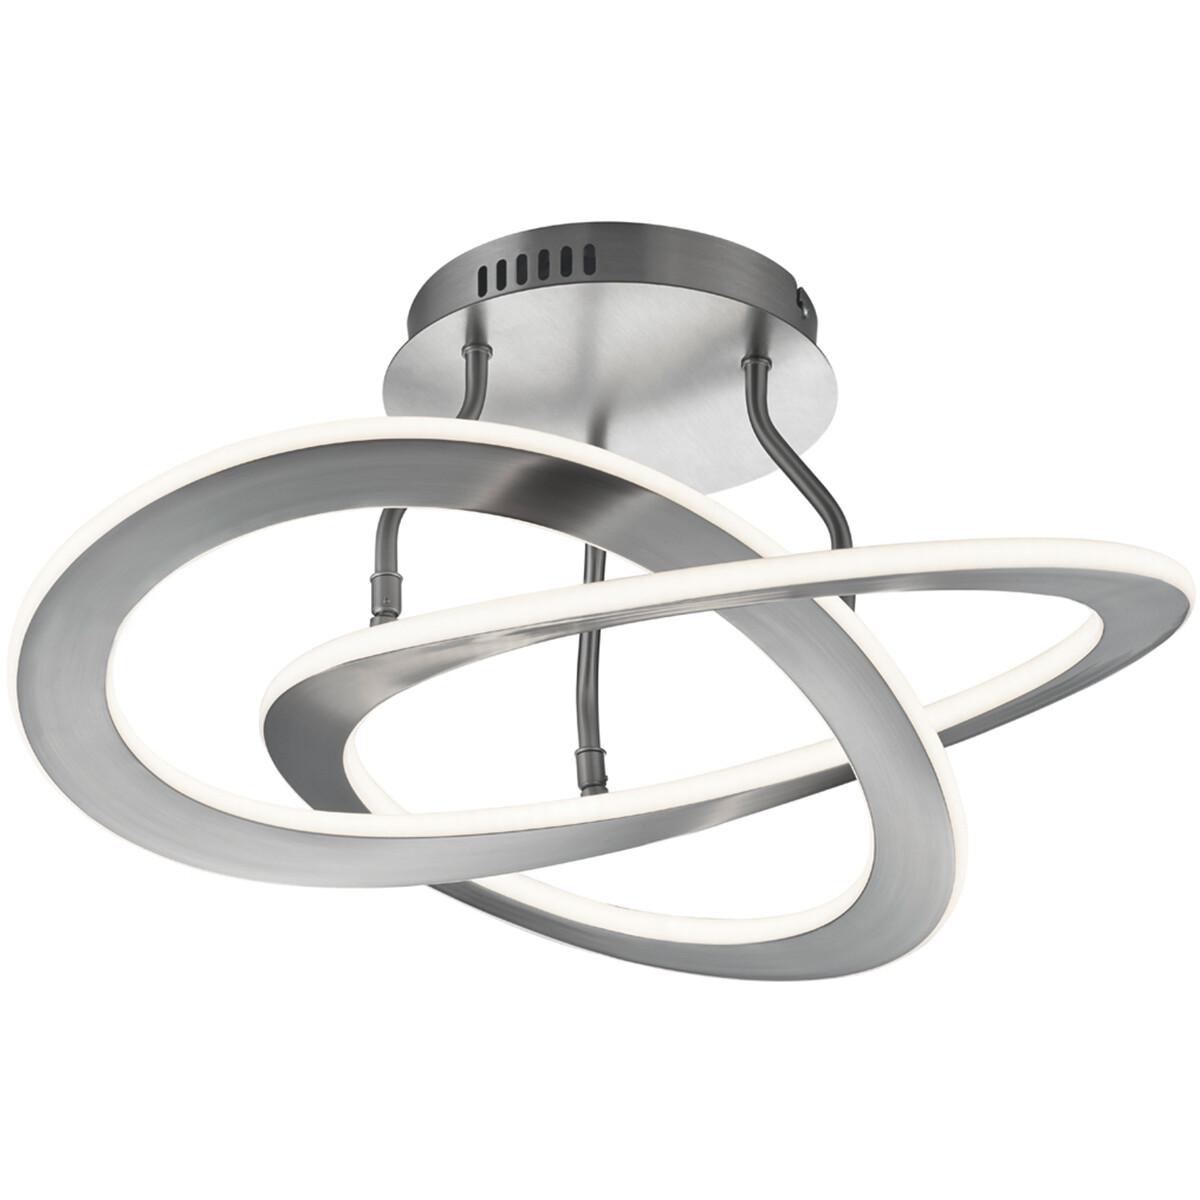 LED Plafondlamp - Plafondverlichting - Trion Oaky - 40W - Warm Wit 3000K - Rond - Mat Nikkel - Alumi